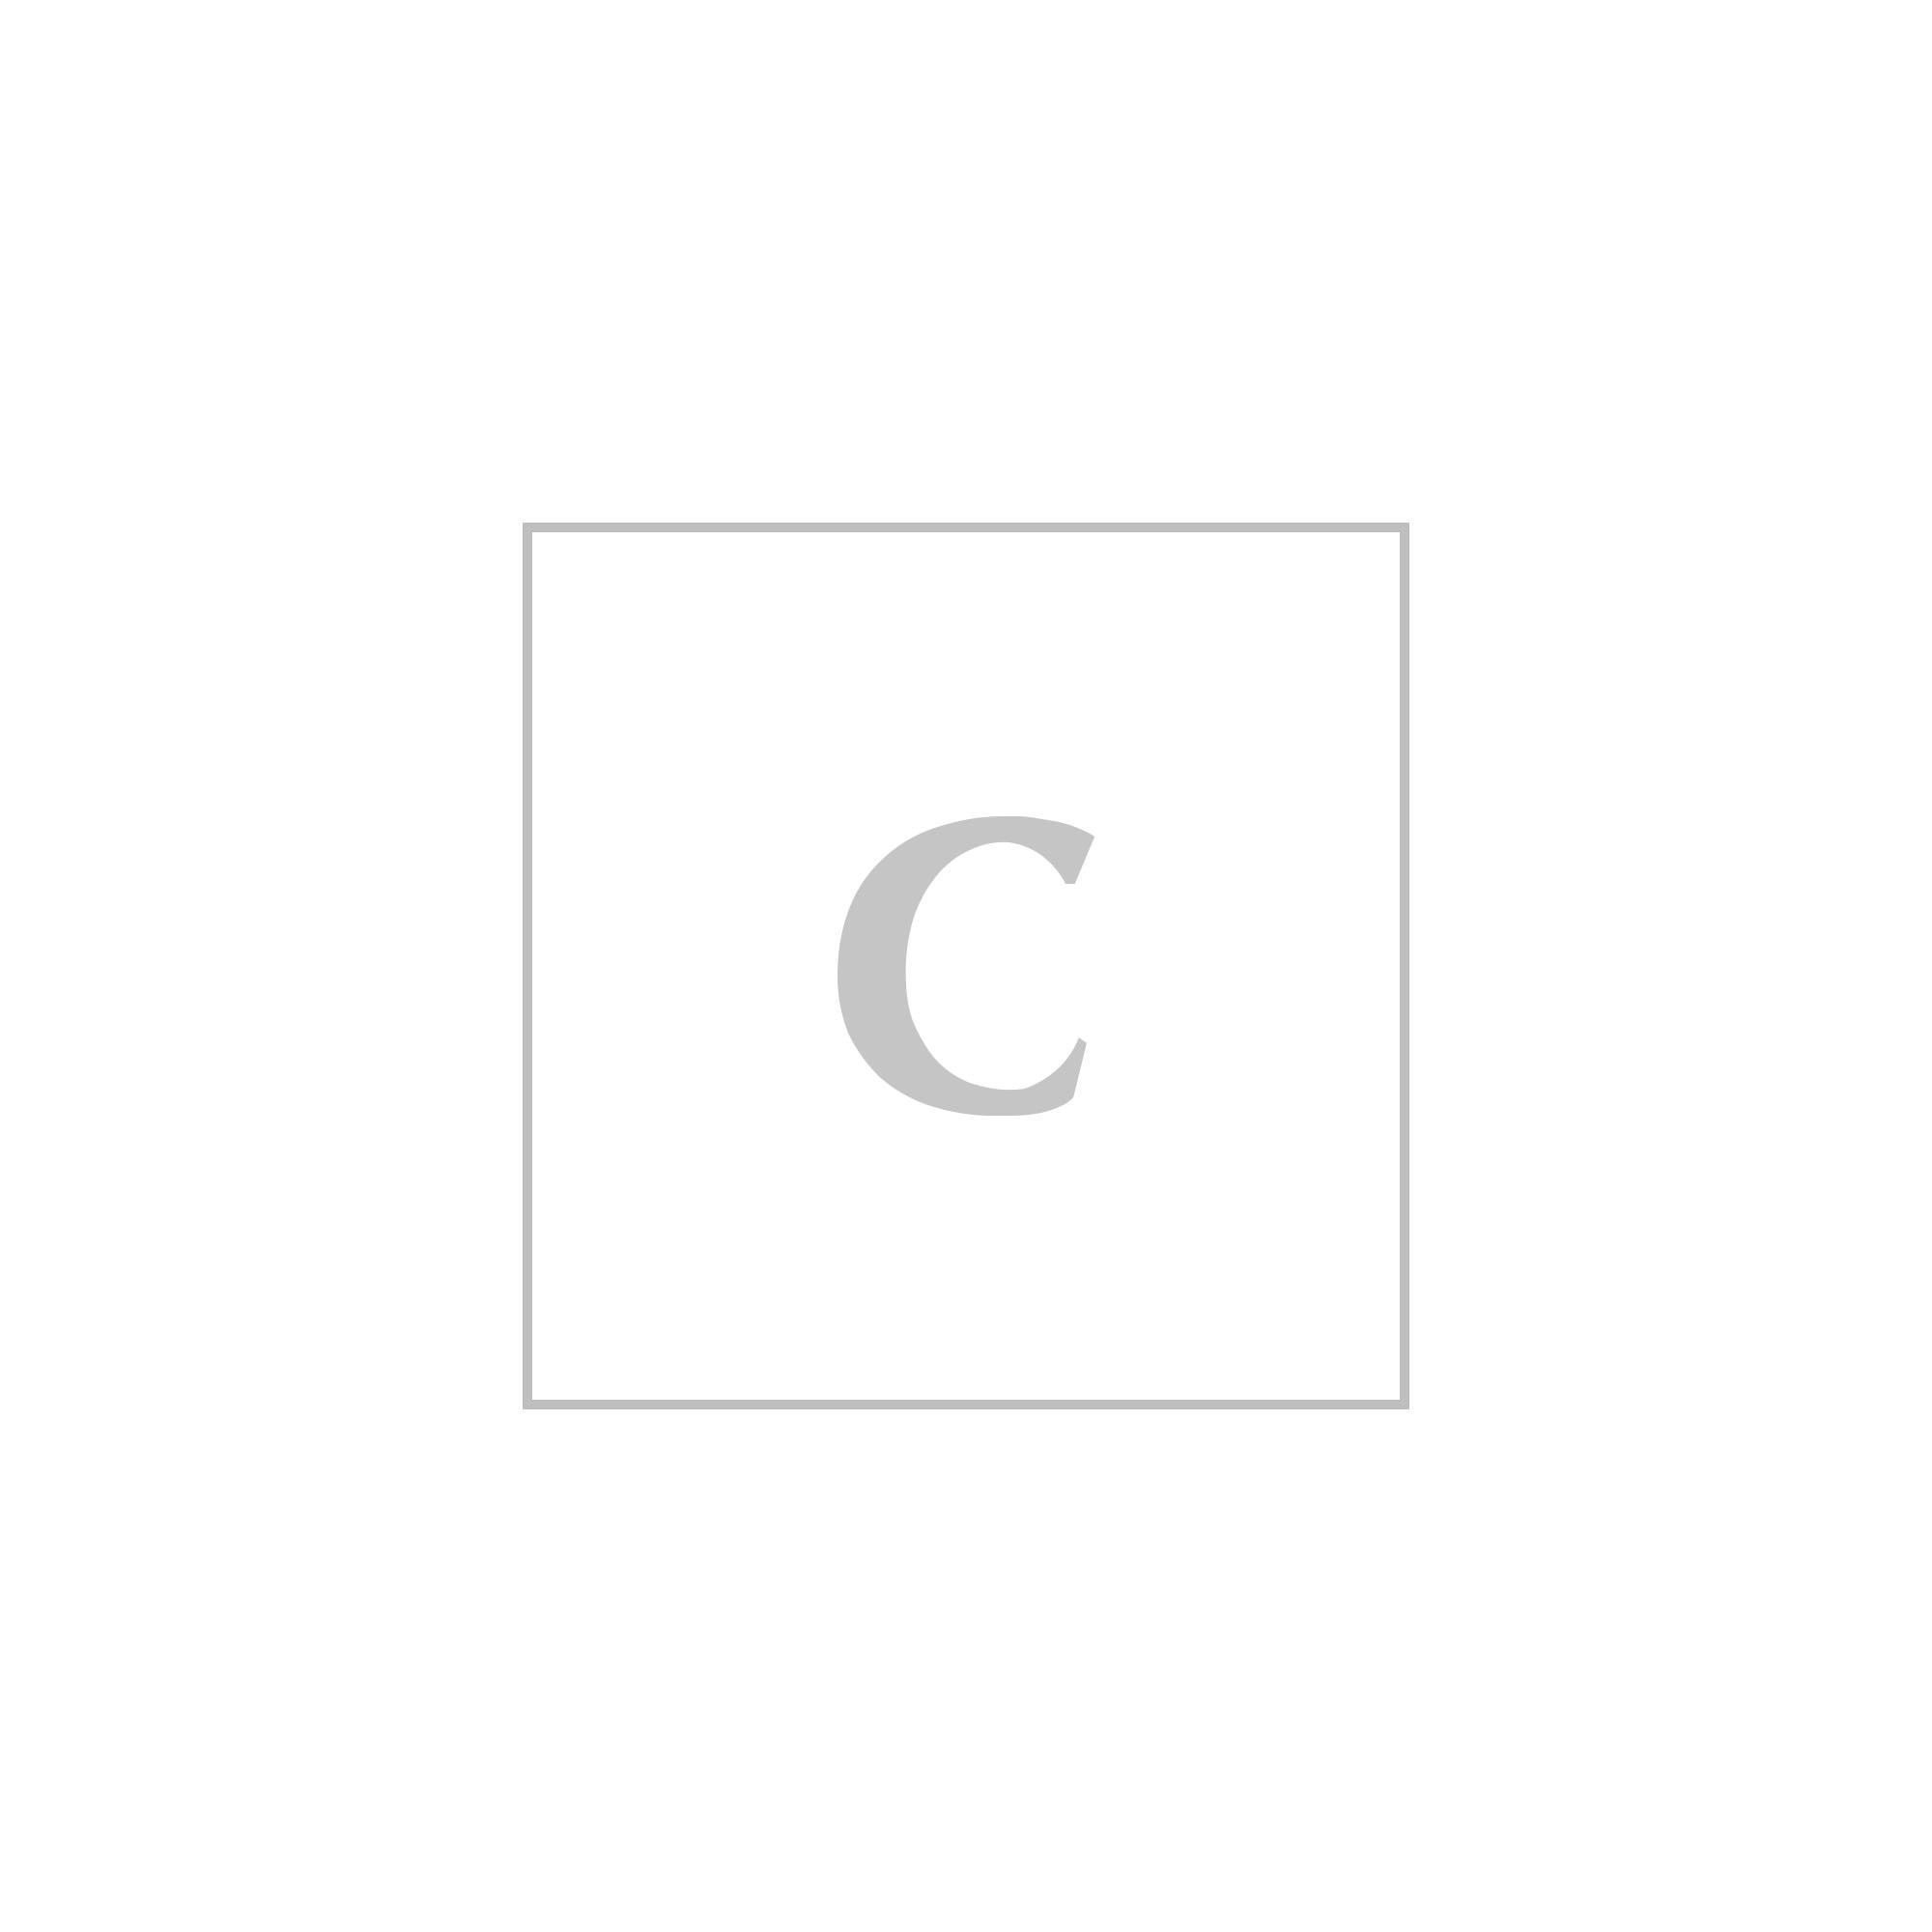 Dolce & gabbana dauphine print riga 4 logo belt